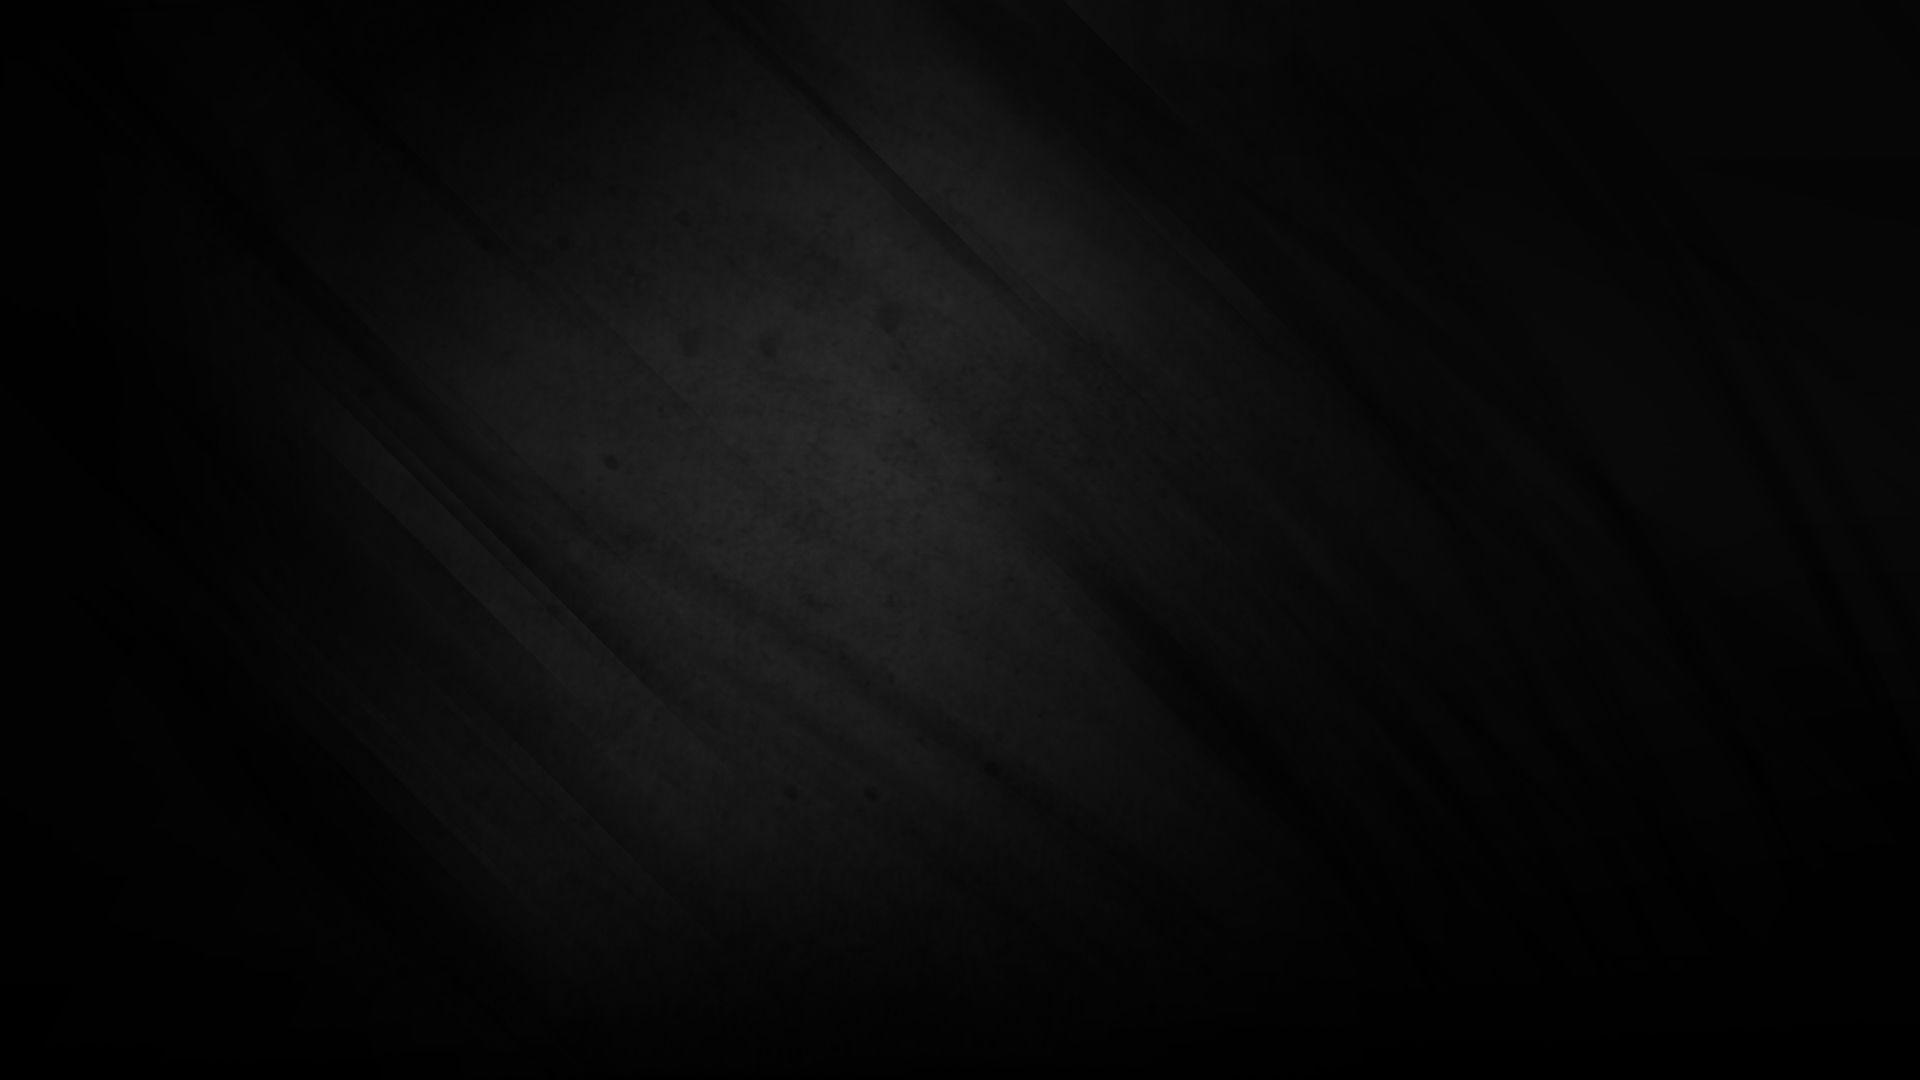 Black Desktop Wallpapers Top Free Black Desktop Backgrounds Wallpaperaccess